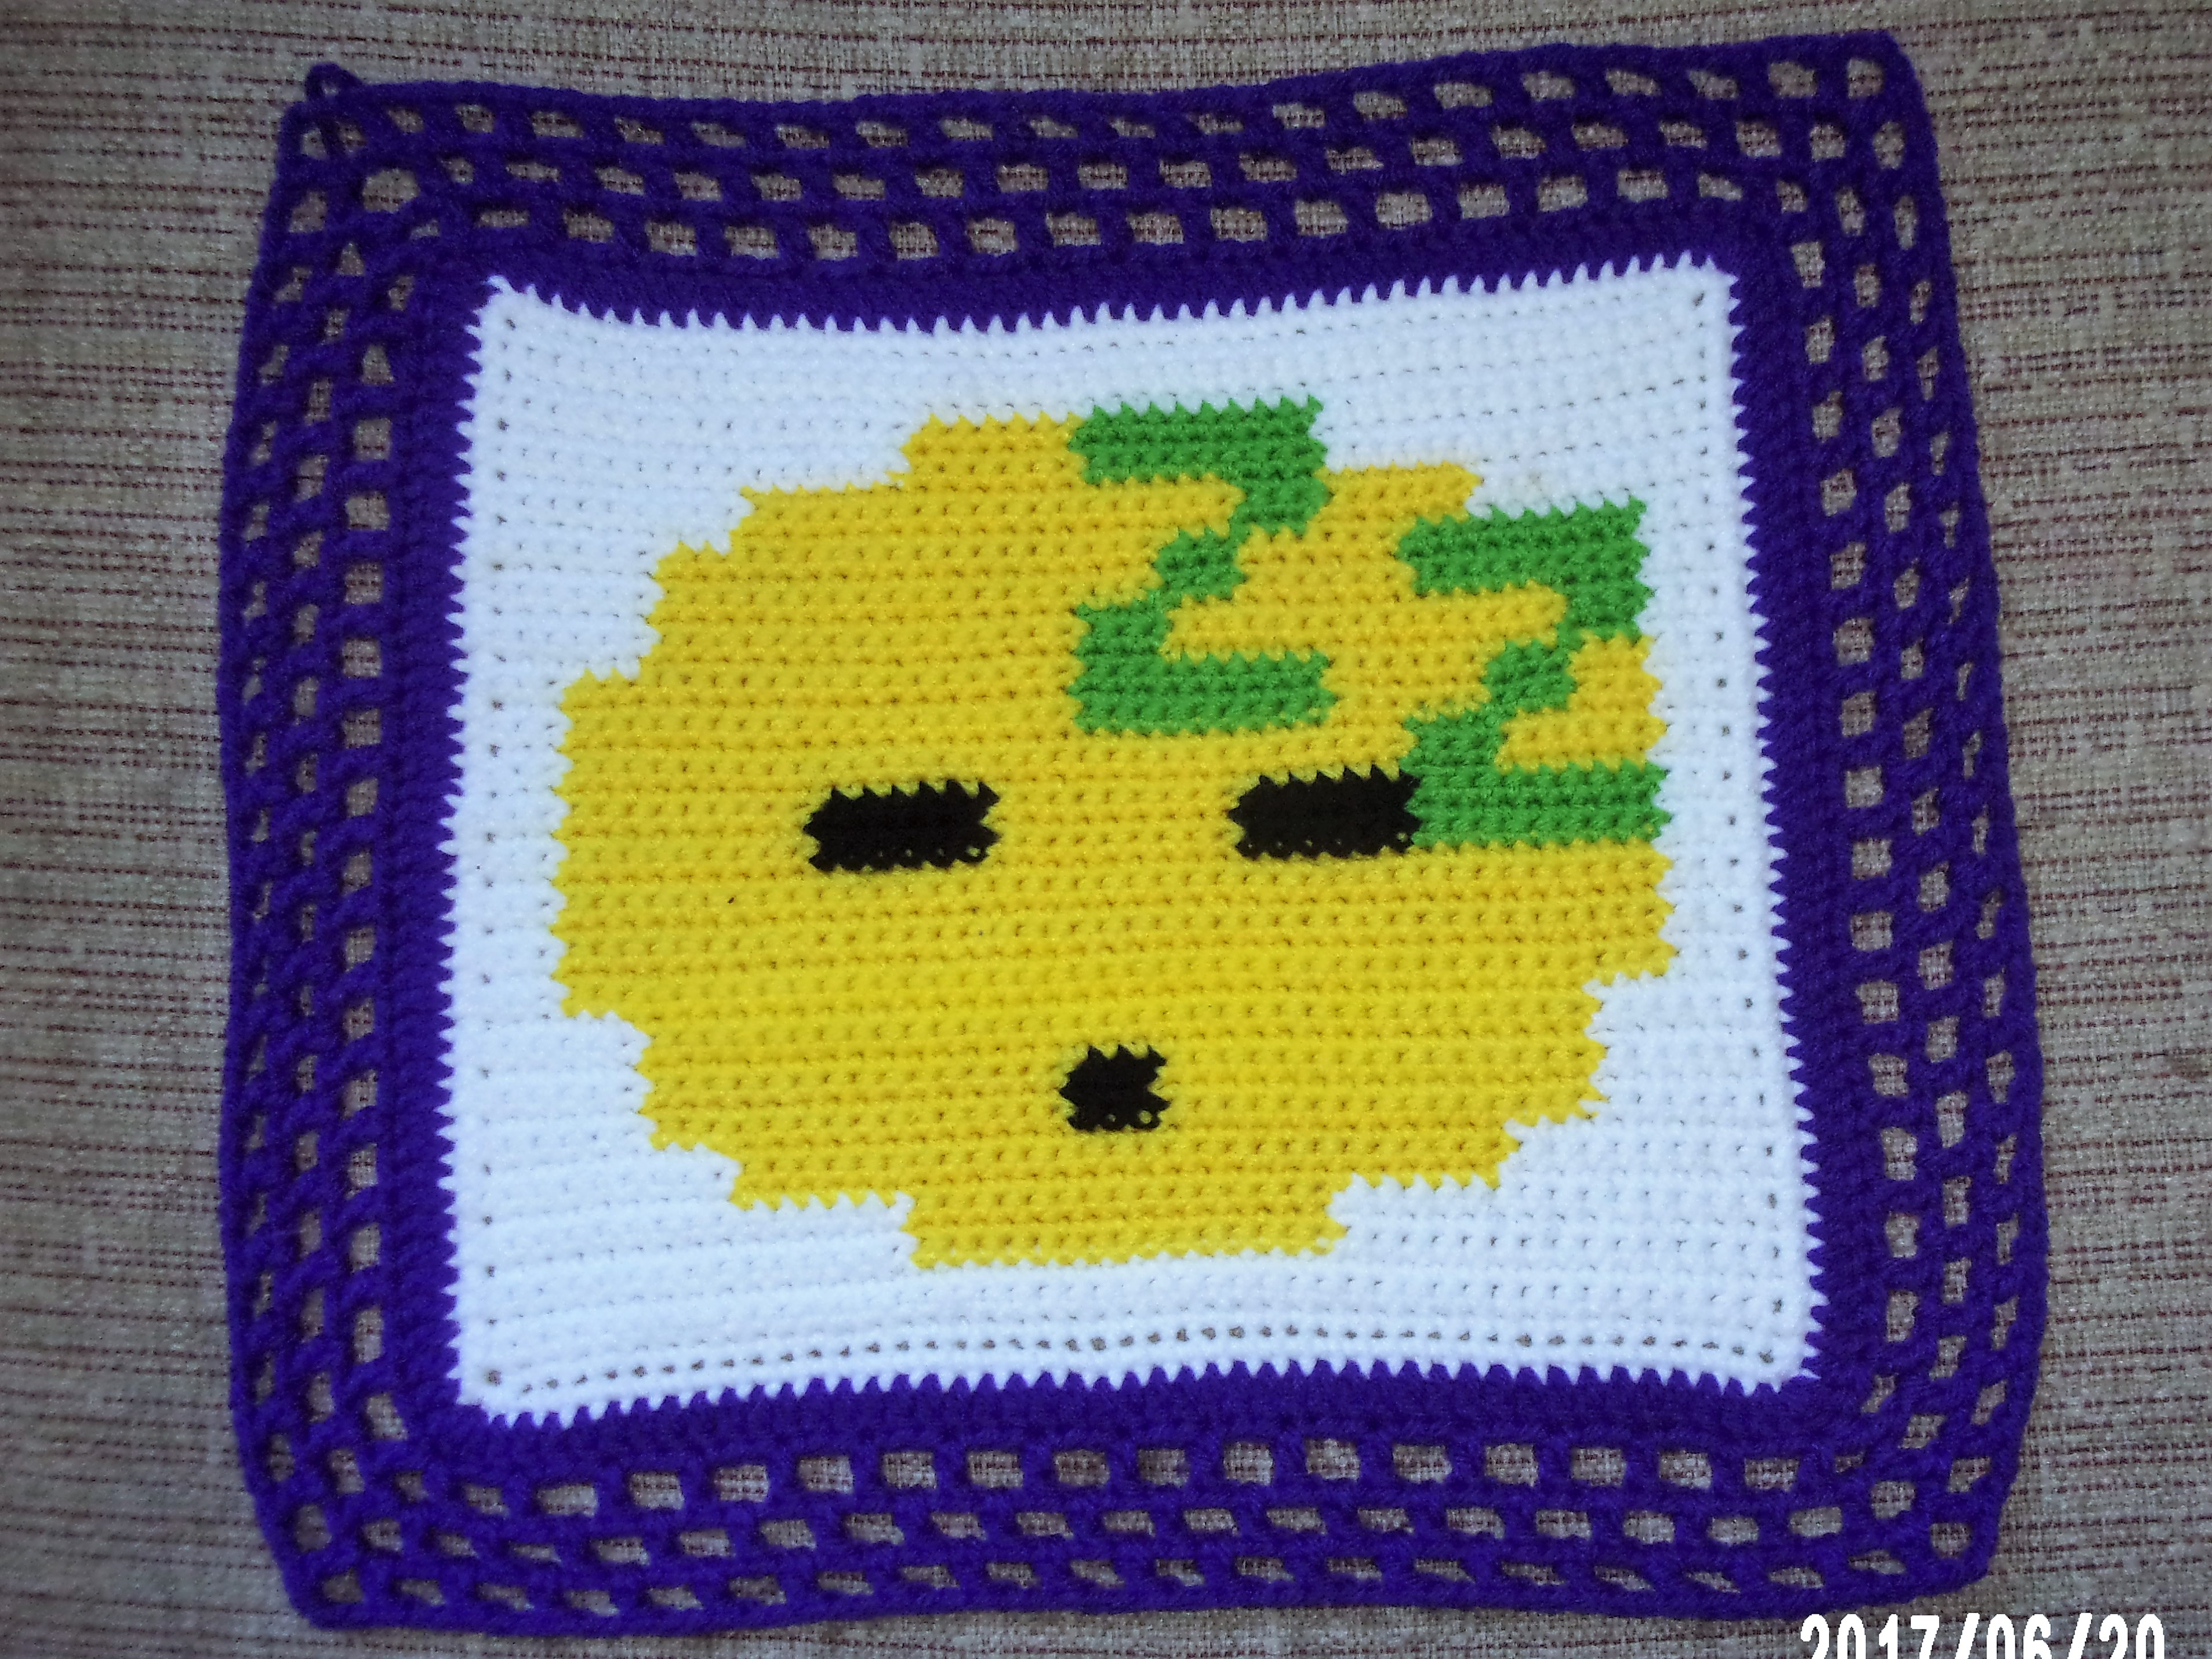 Sleepy Emoji Pillow, 12 inch by 12 inch Emoji Pillow